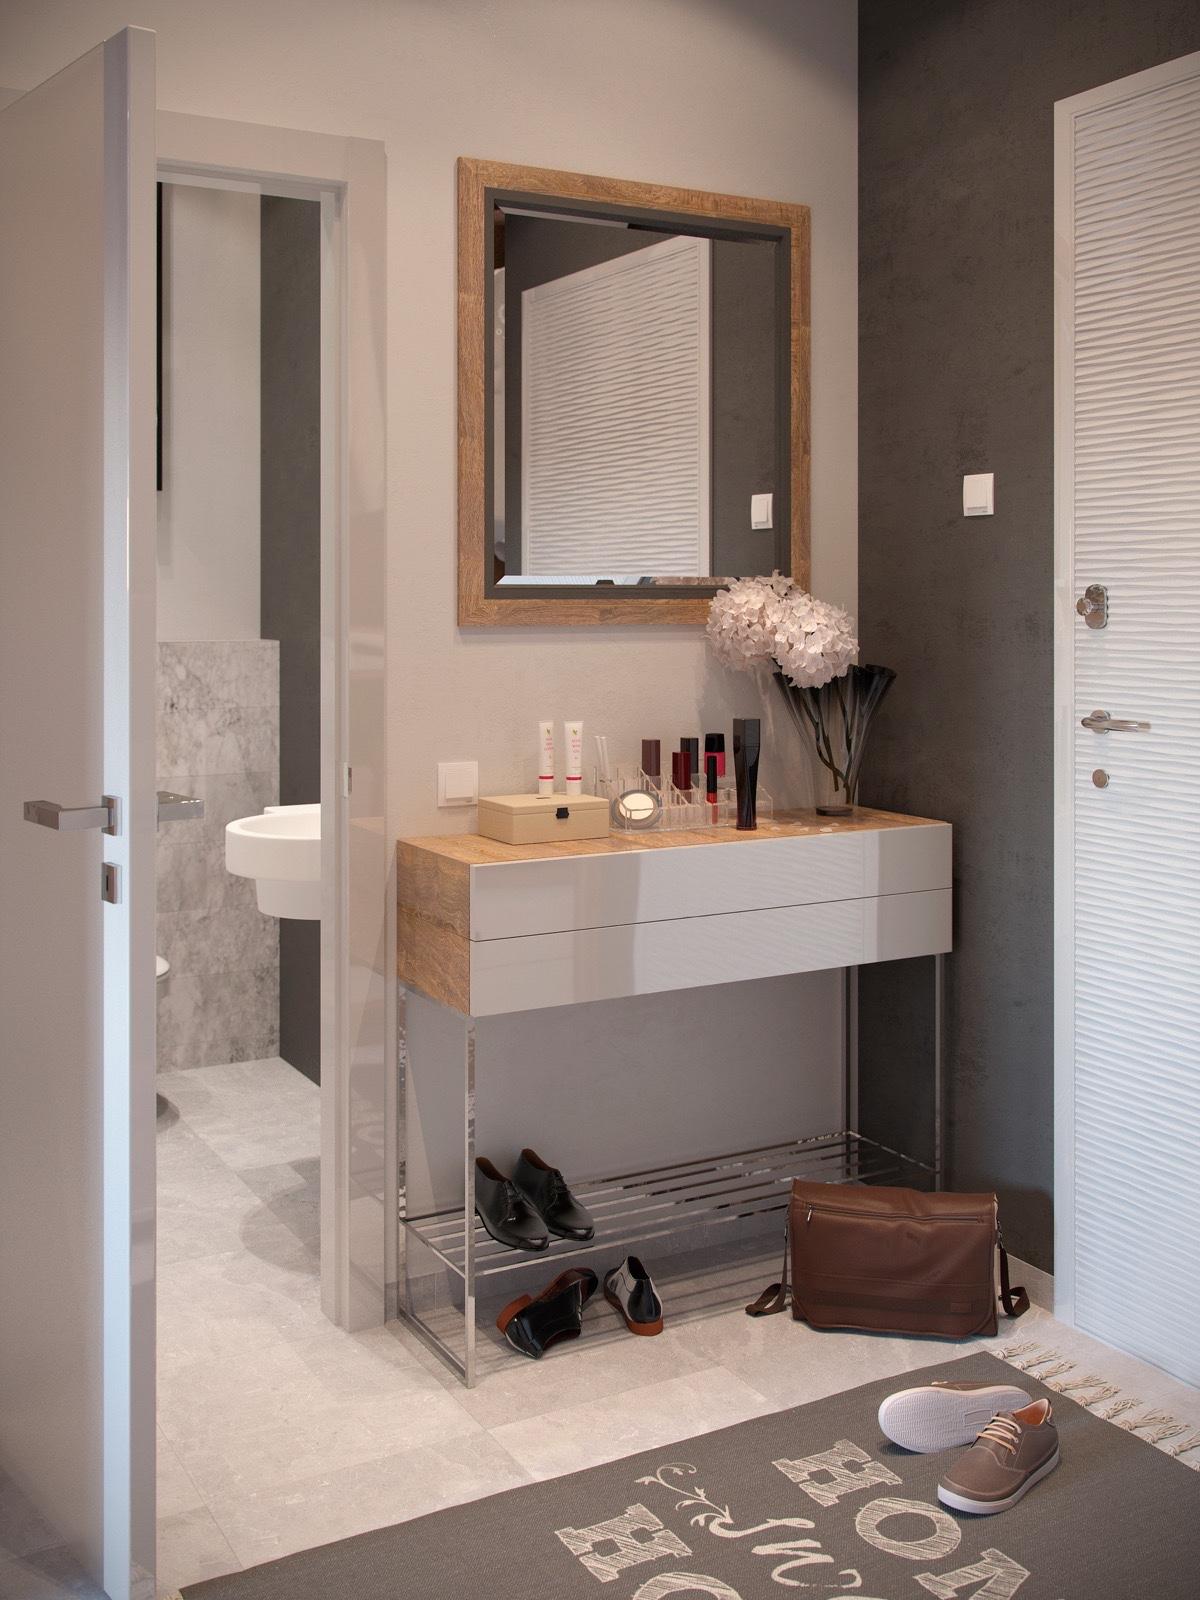 Contemporary Studio Apartment Design: Bold Decor In Small Spaces: 3 Homes Under 50 Square Meters